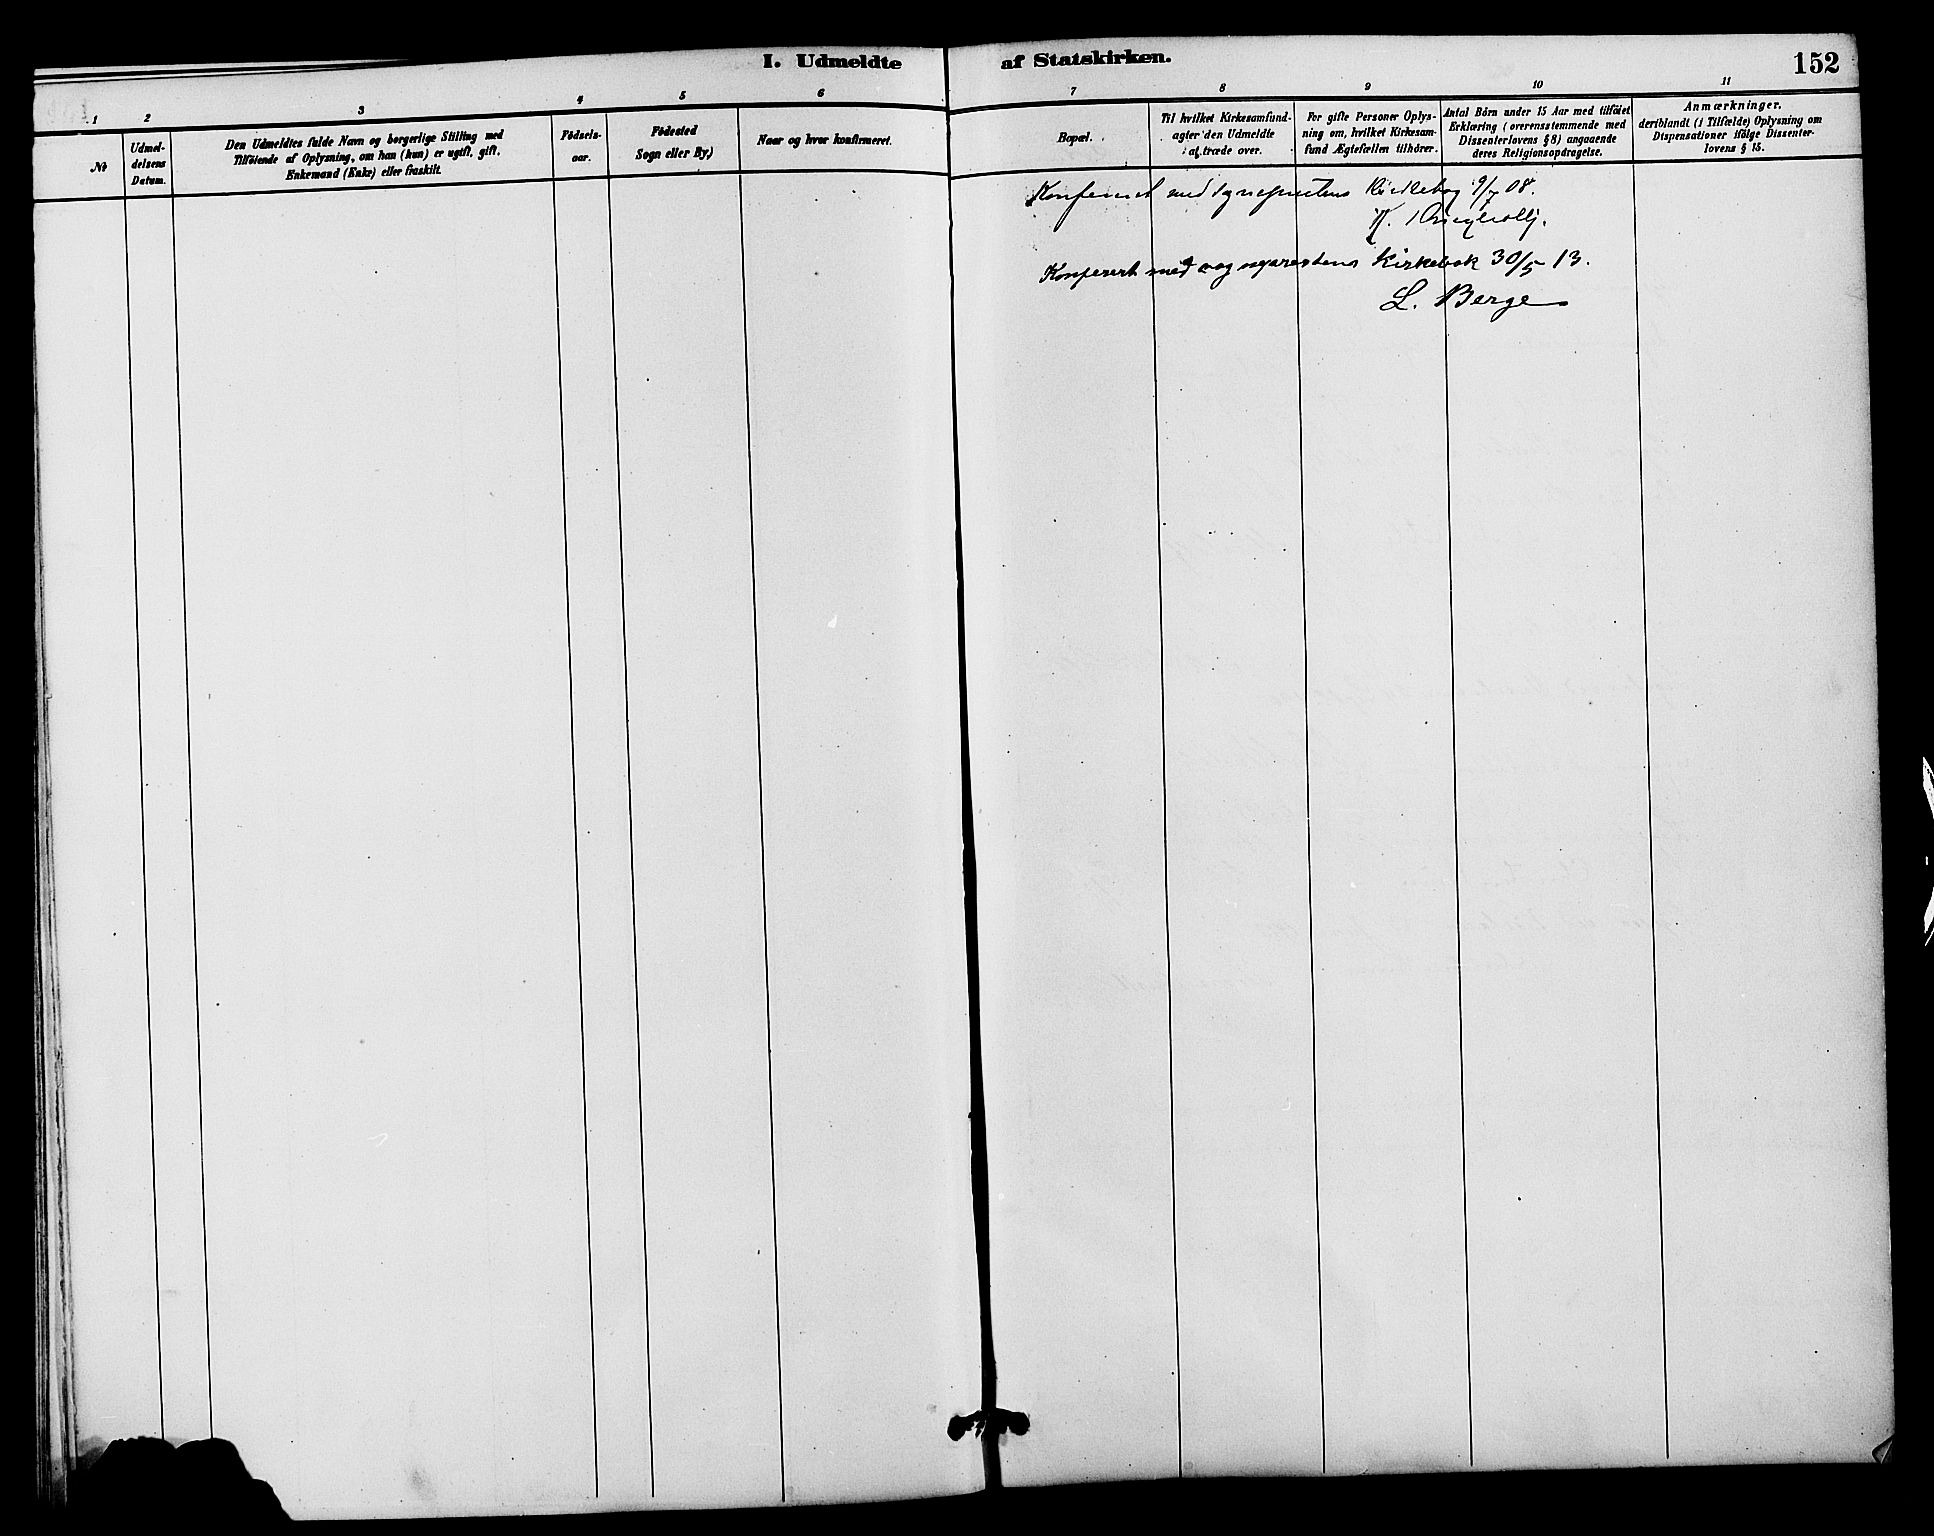 SAH, Vestre Slidre prestekontor, Klokkerbok nr. 4, 1881-1912, s. 152